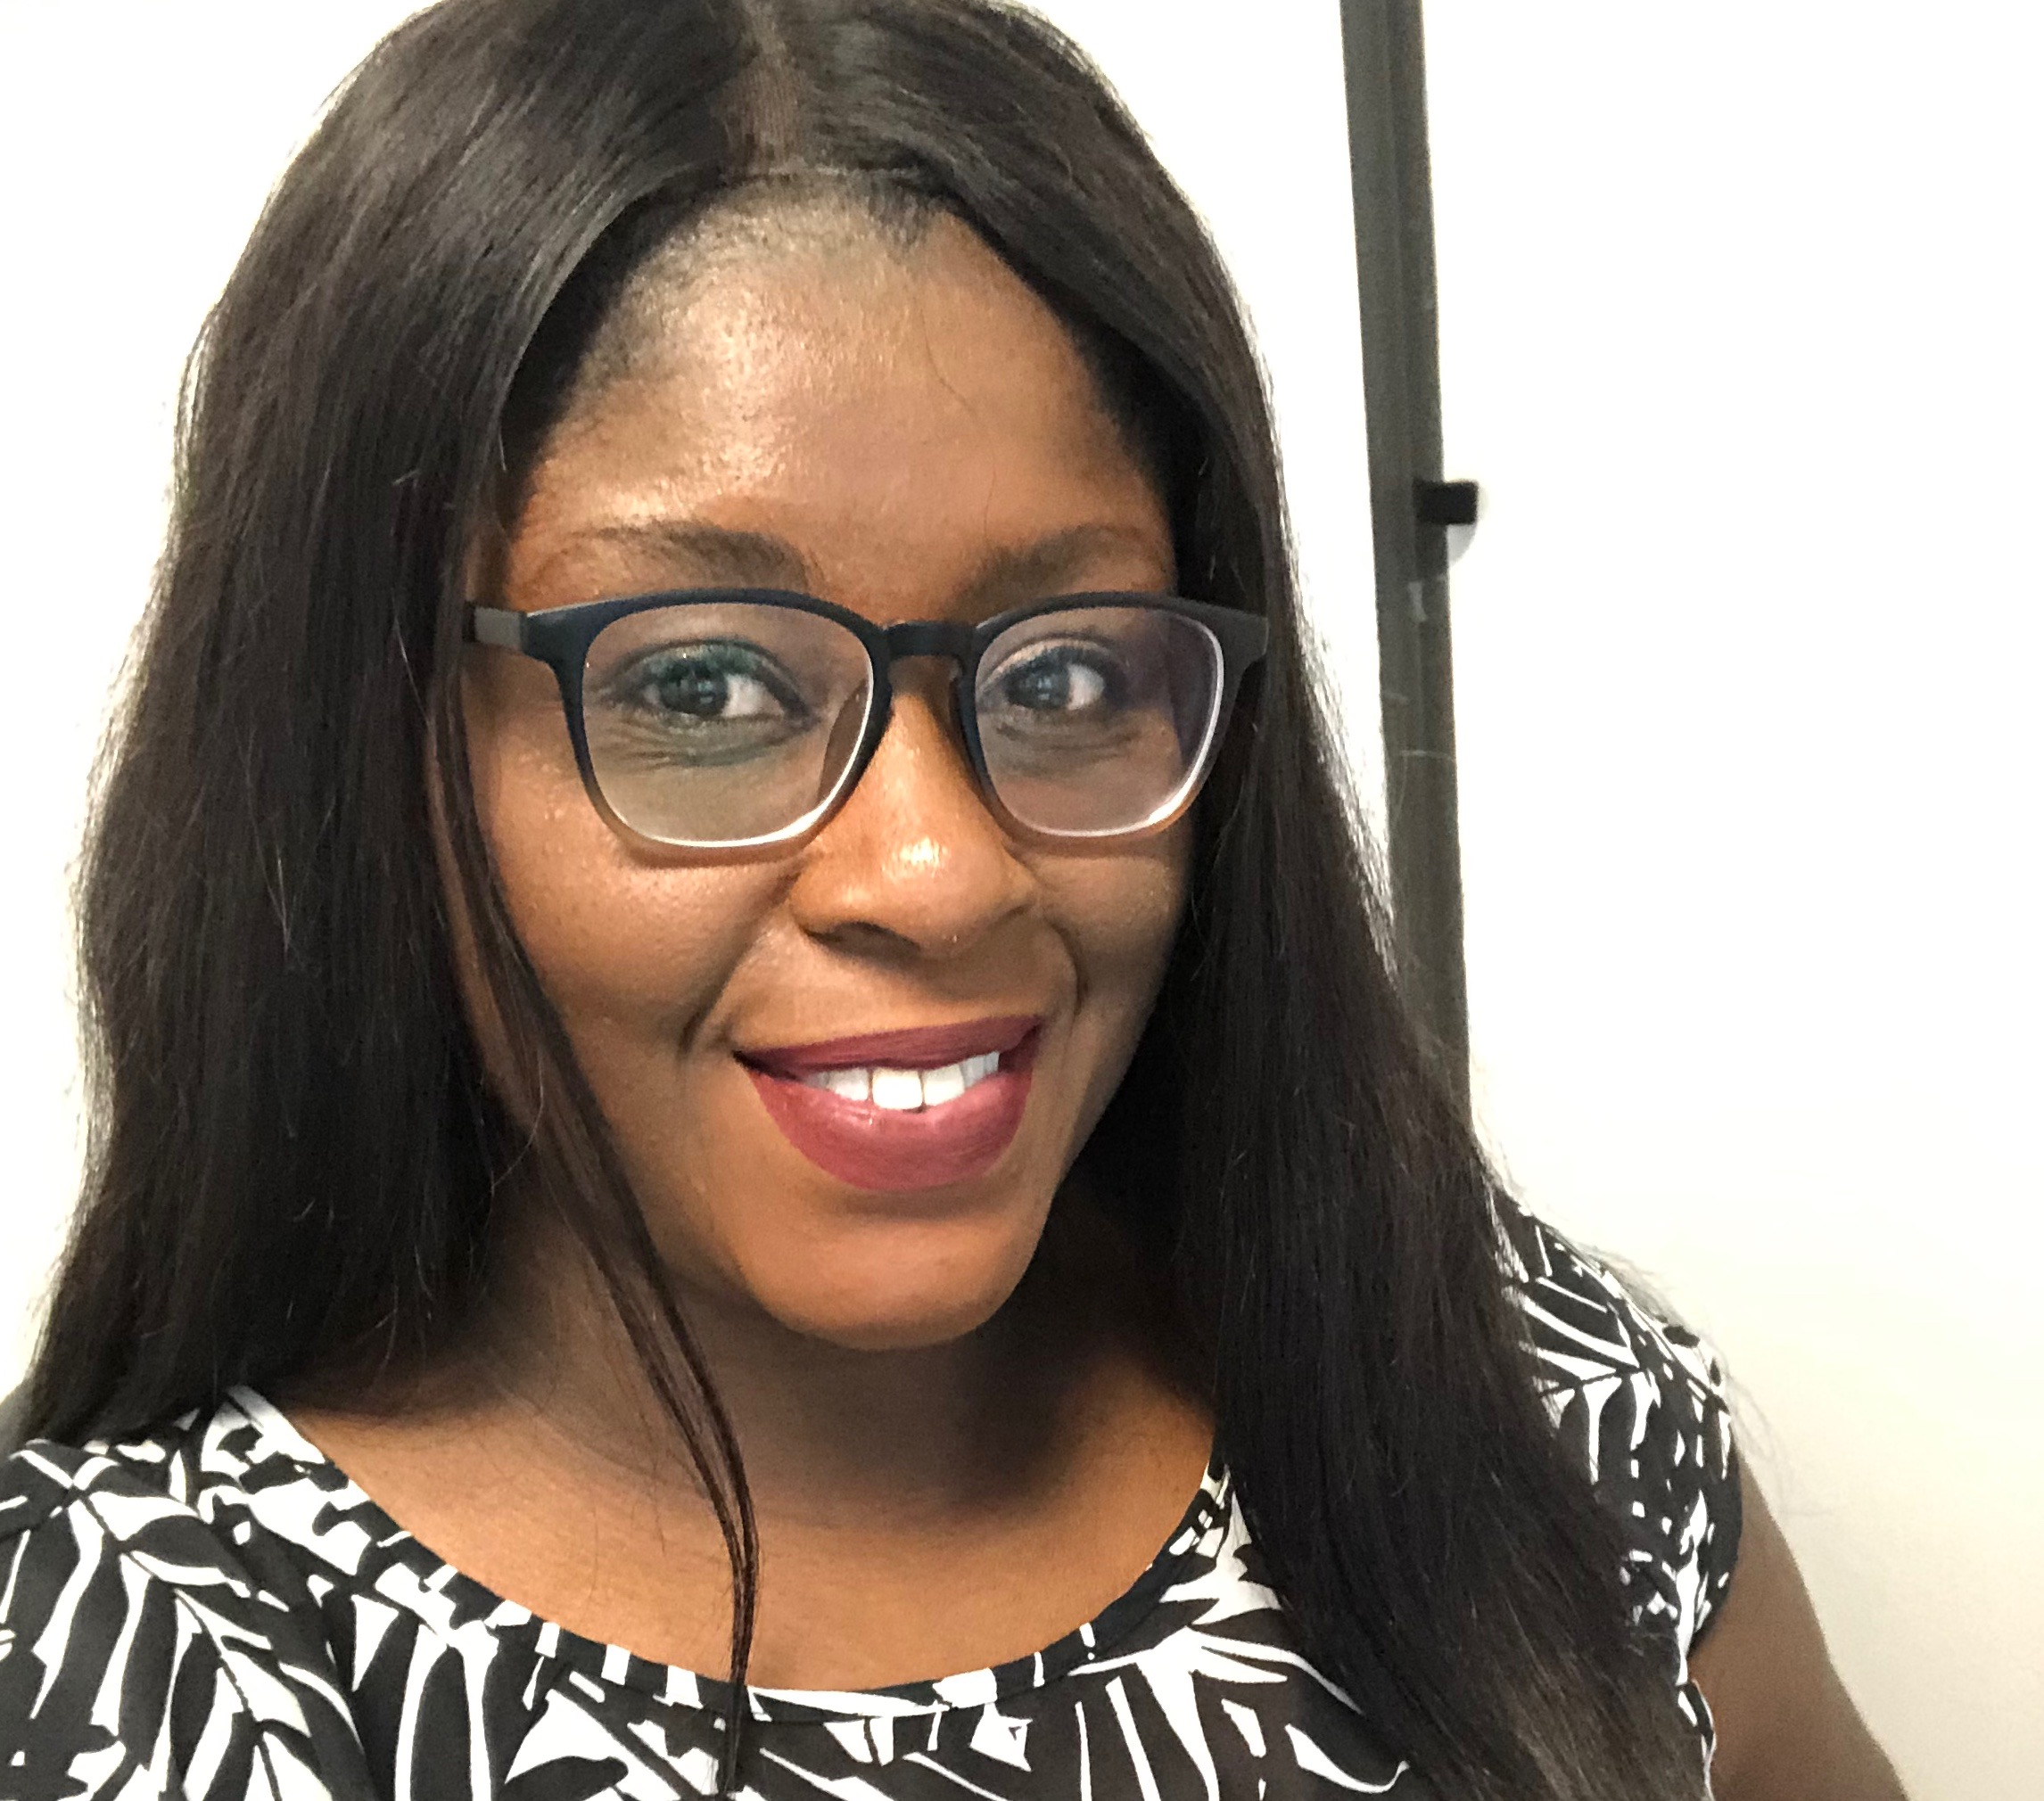 Melissa Greensboro Therapist & ESA Letter specialist at Santos Counseling Near Greensboro, NC